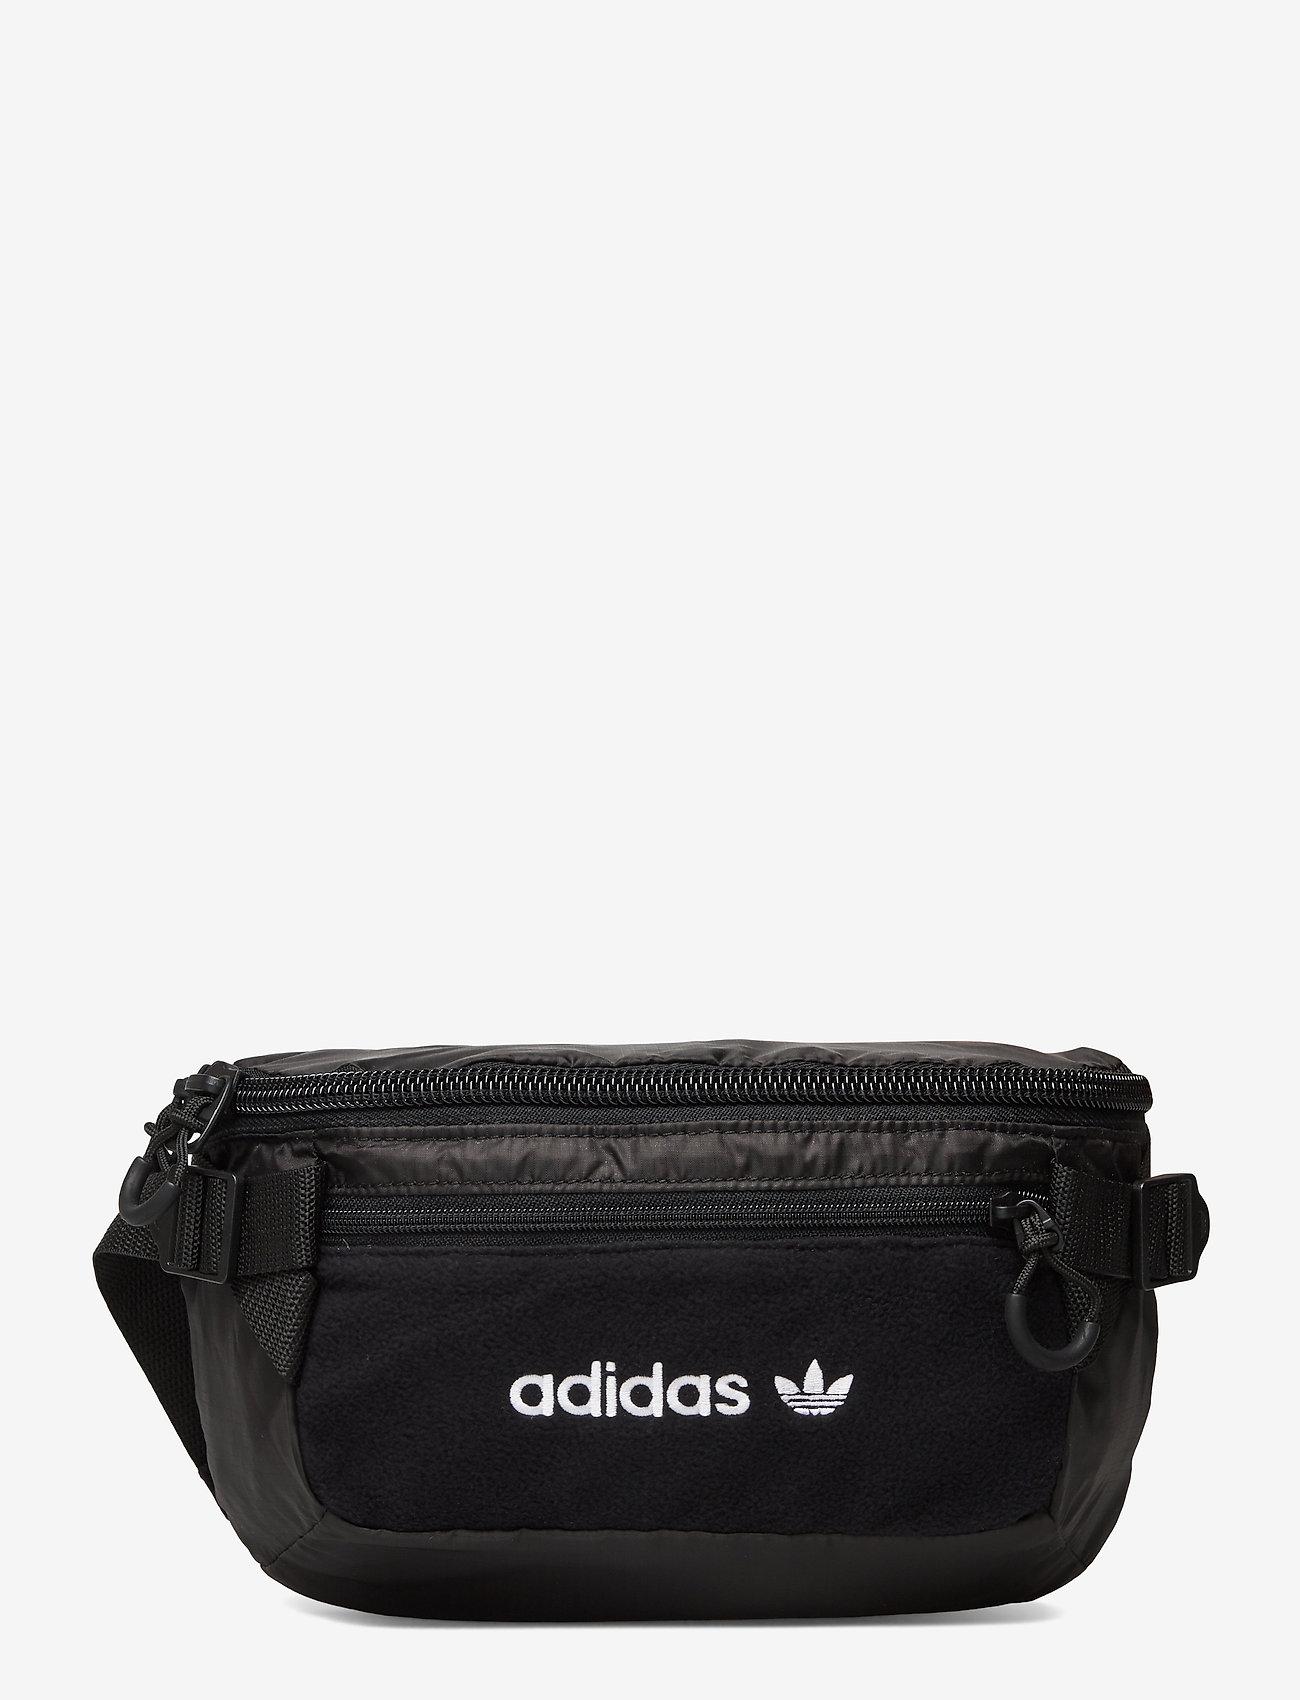 adidas Originals - PE WAISTBAG L - vyölaukut - black/white - 0